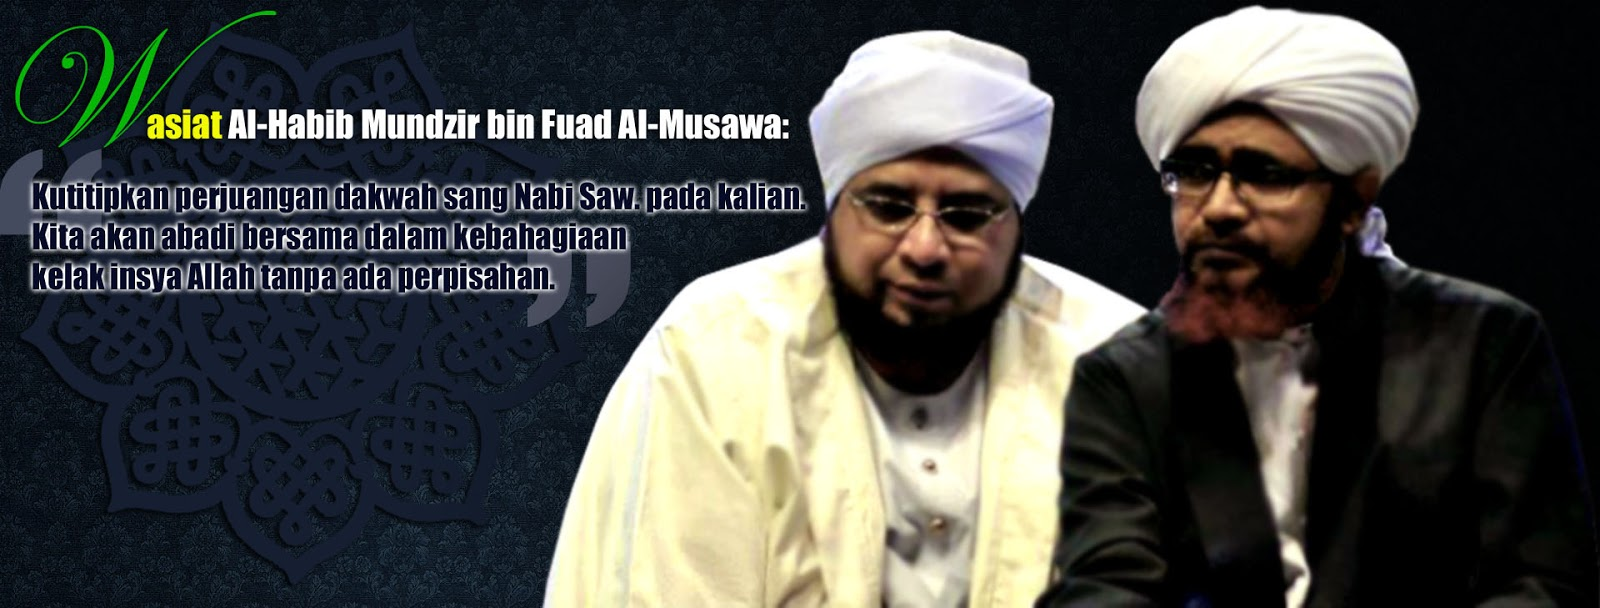 +dakwah+sang+Nabi+Saw.+pada+kalian+(Al-Habib+Mundzir+Al-Musaw).jpg